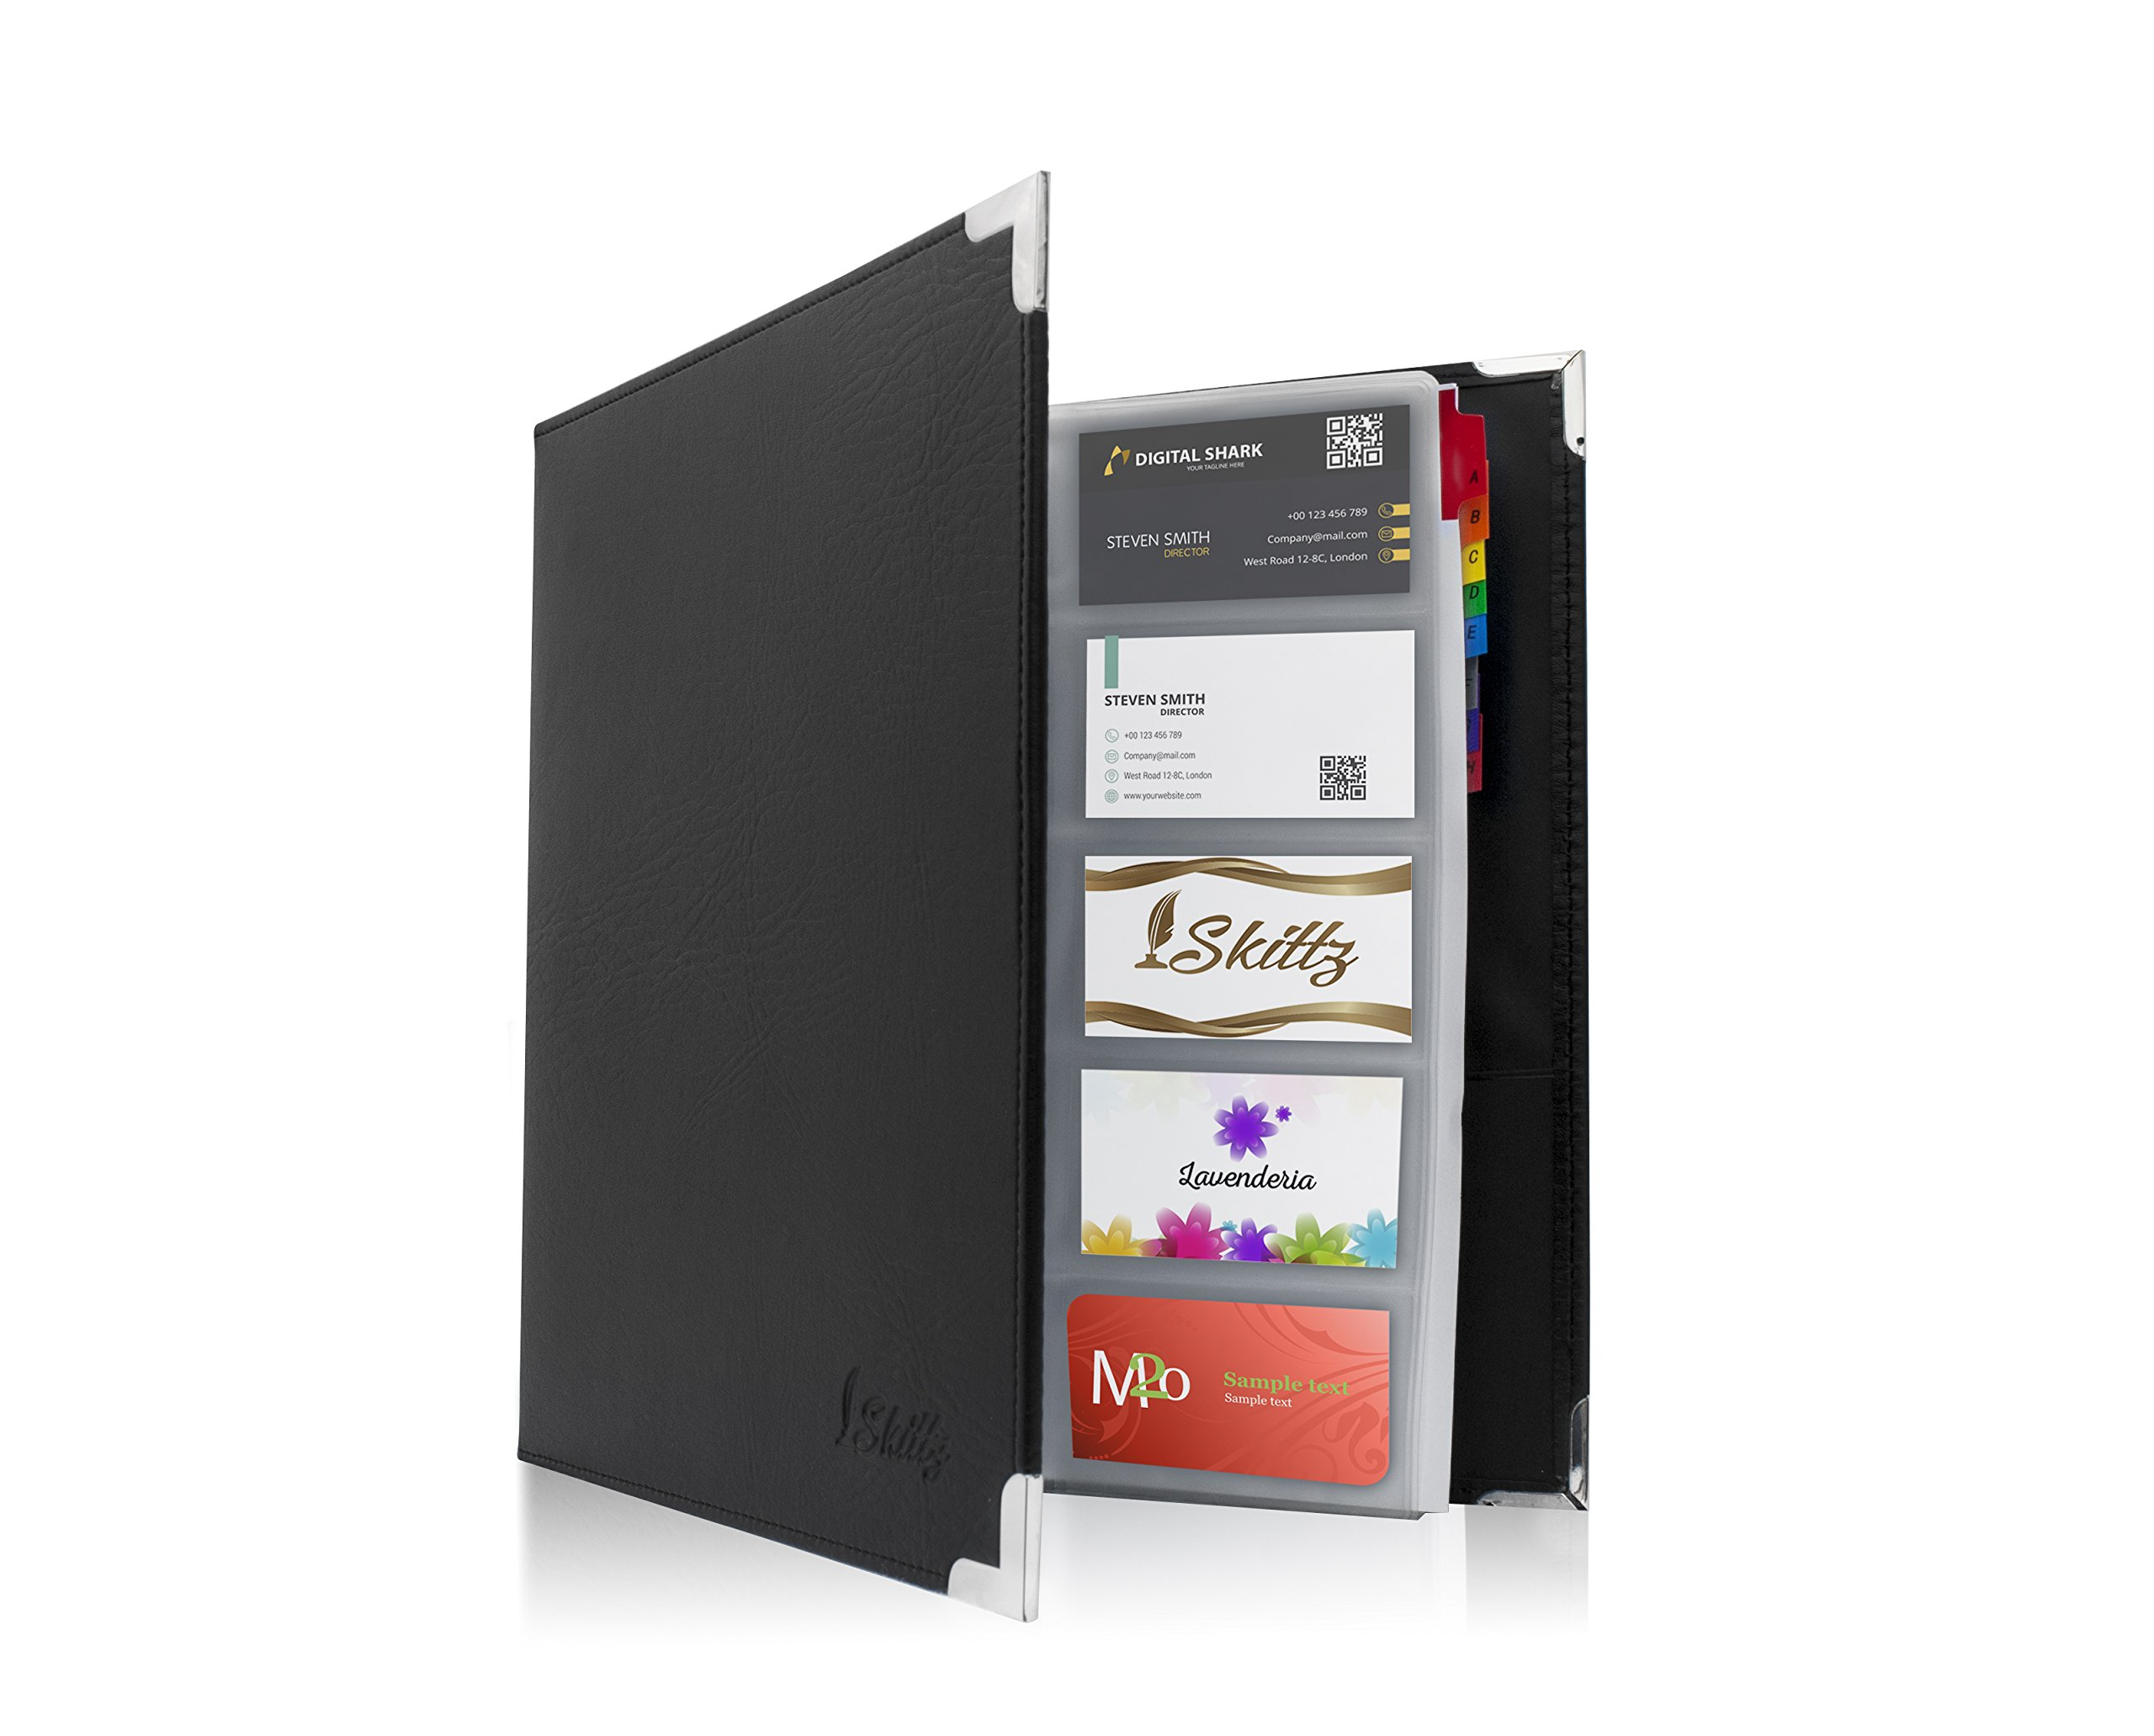 Skittz Business Card Book Leather Organizer Binder W/ Sleeves 600 Storage Capacity